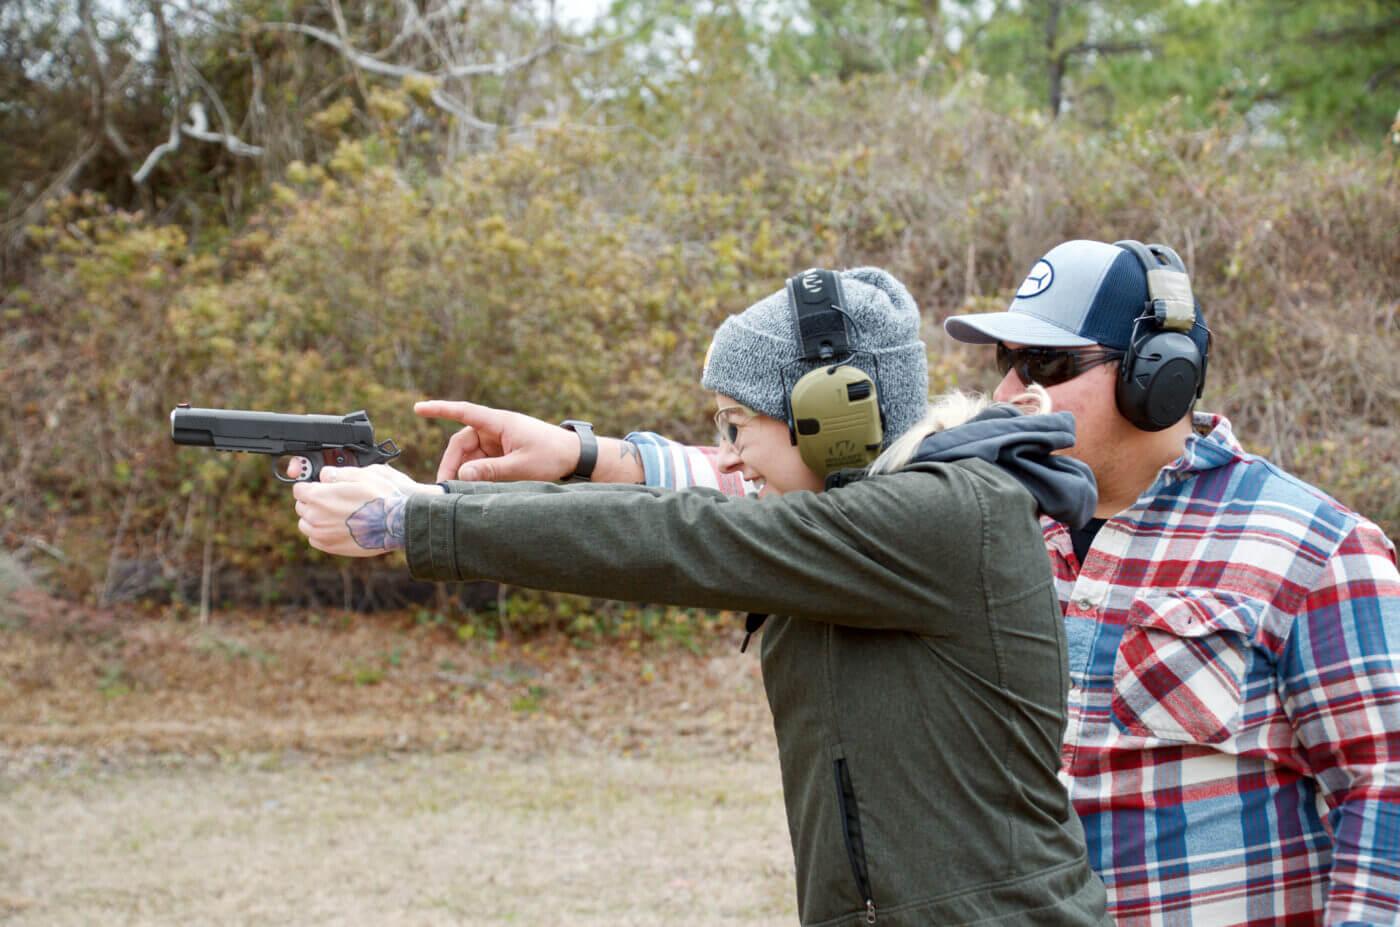 Man teaching a new shooter with a 1911 pistol